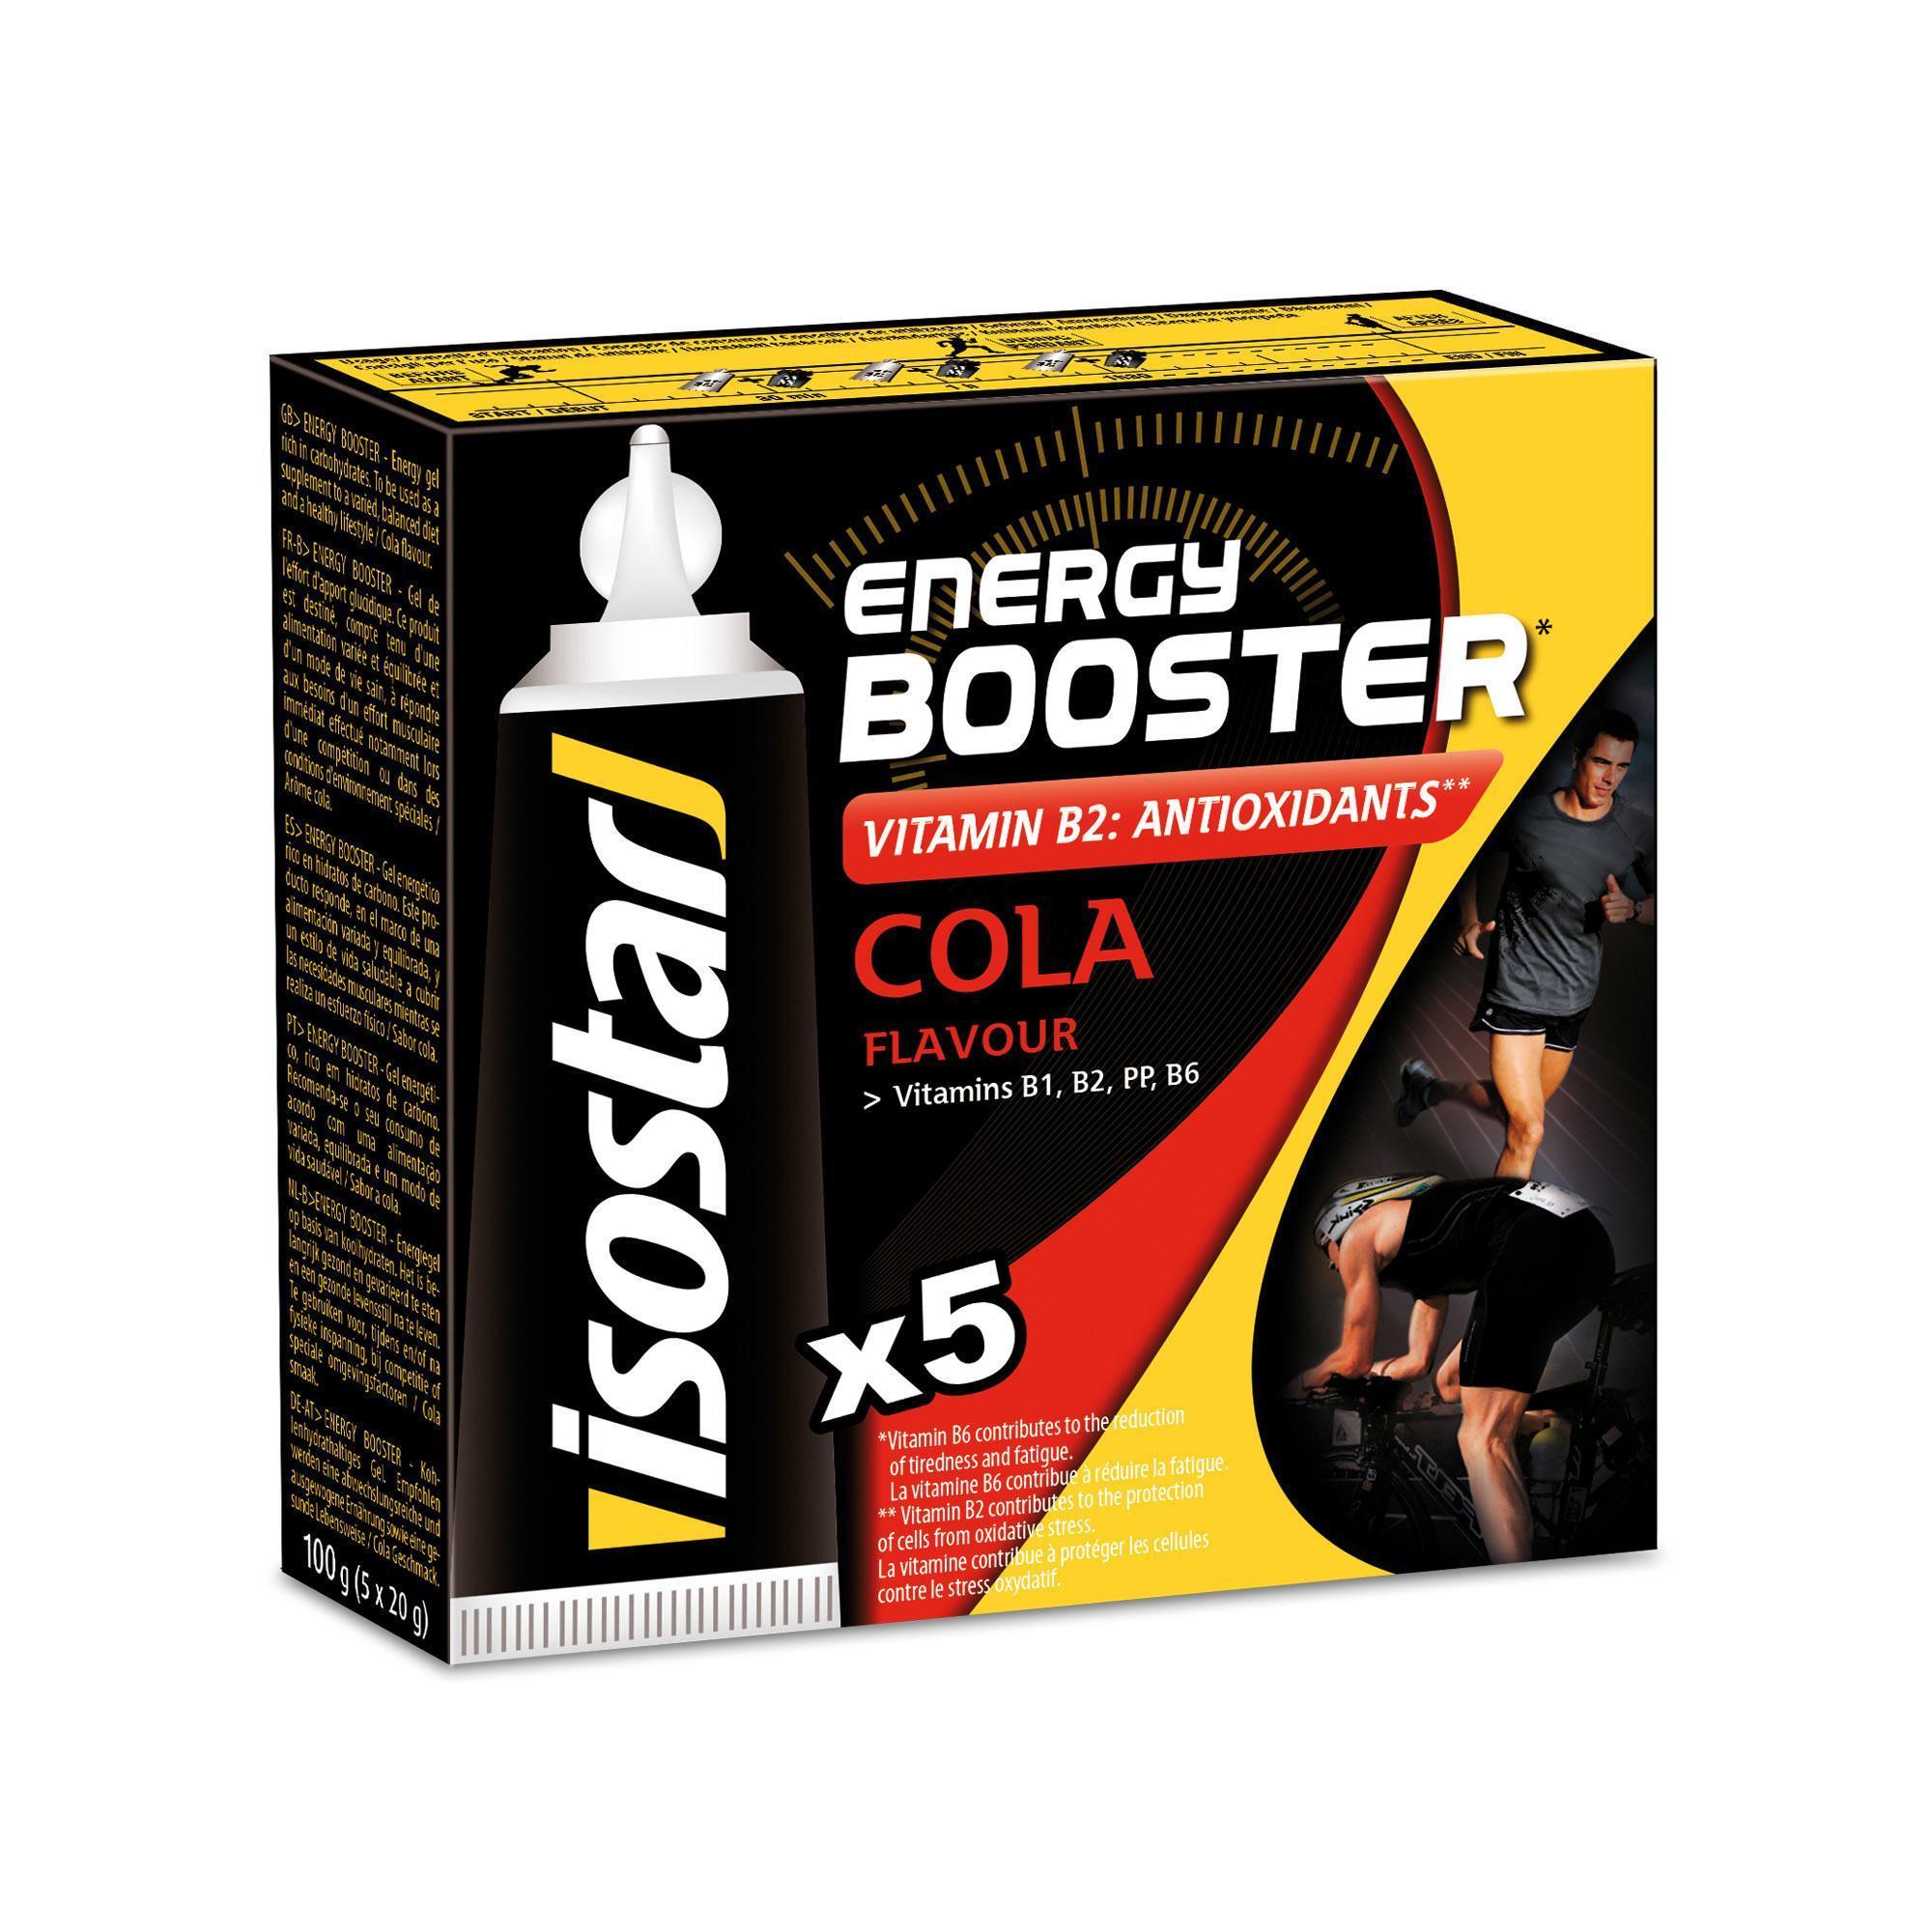 Isostar Energy Booster Cola 5x20gram